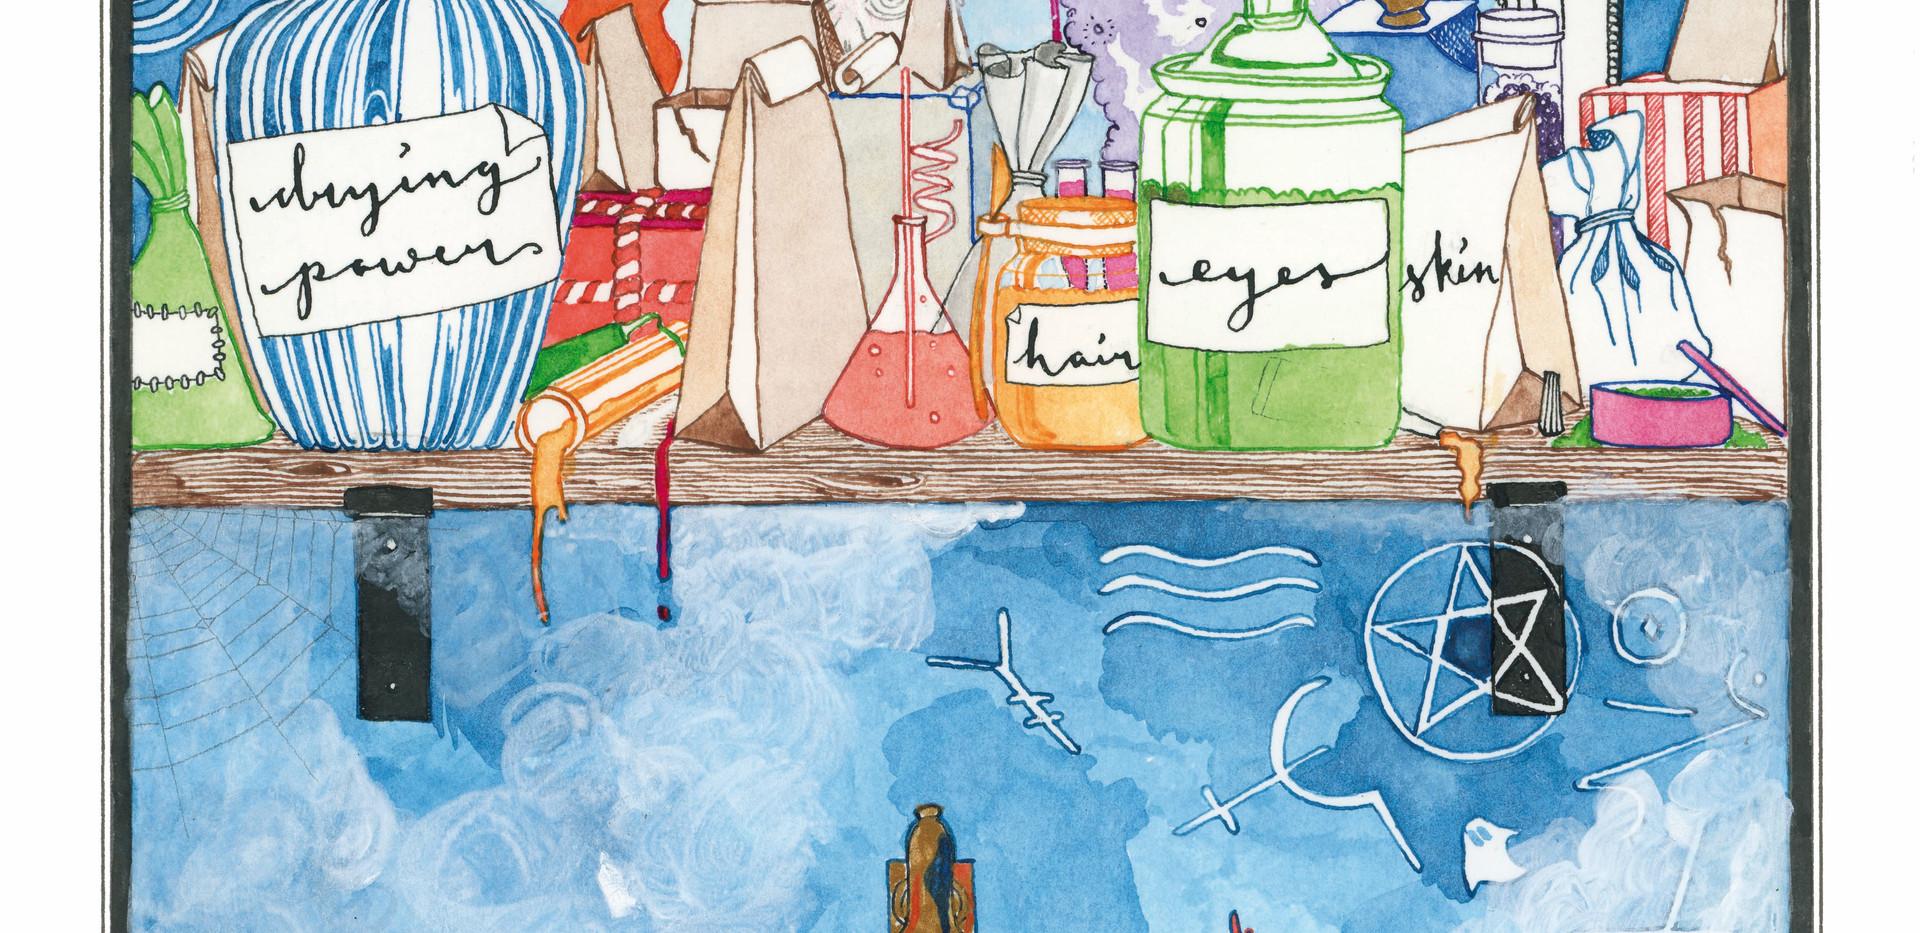 Illustration for Howl's Moving Castle by Diana Wynne Jones